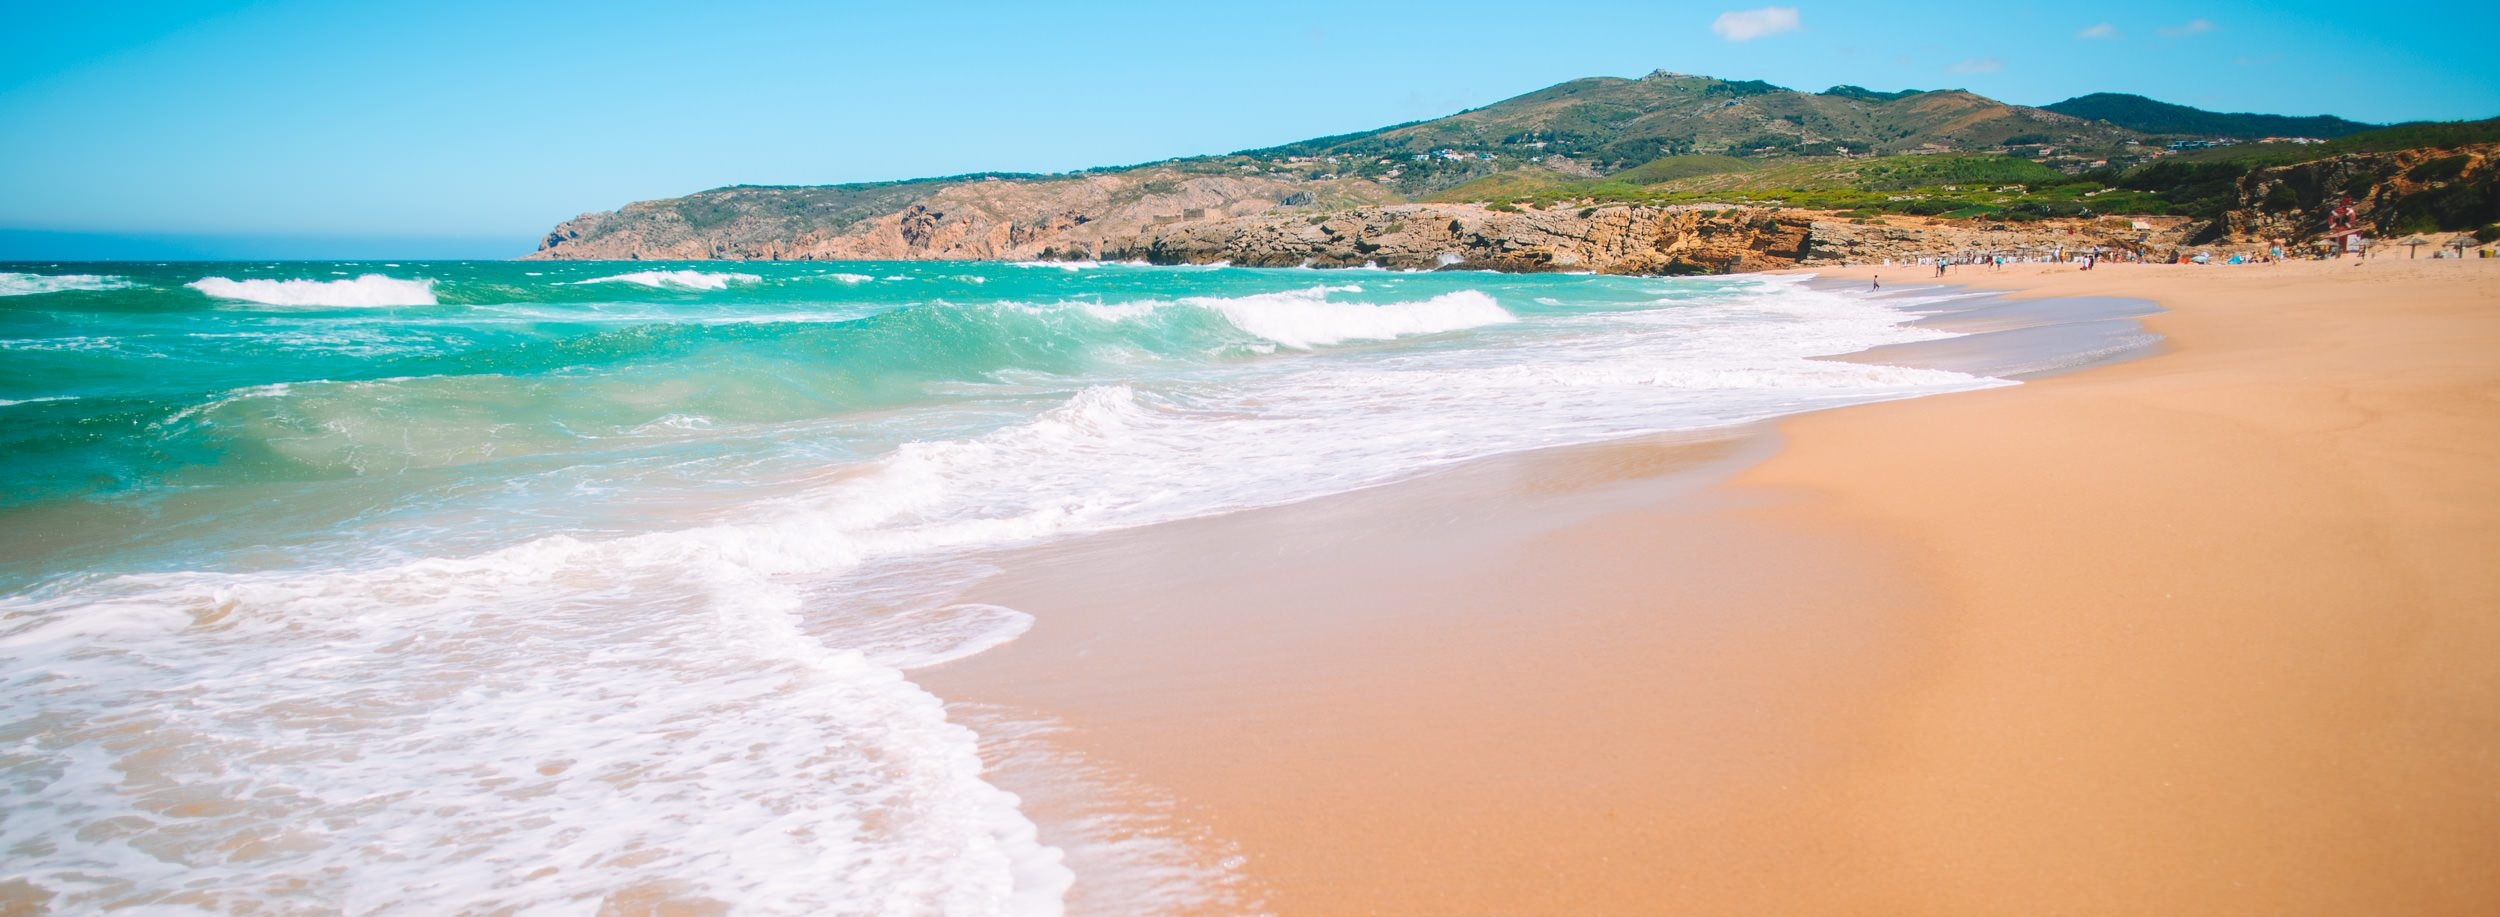 plaze-kolo-lizbony